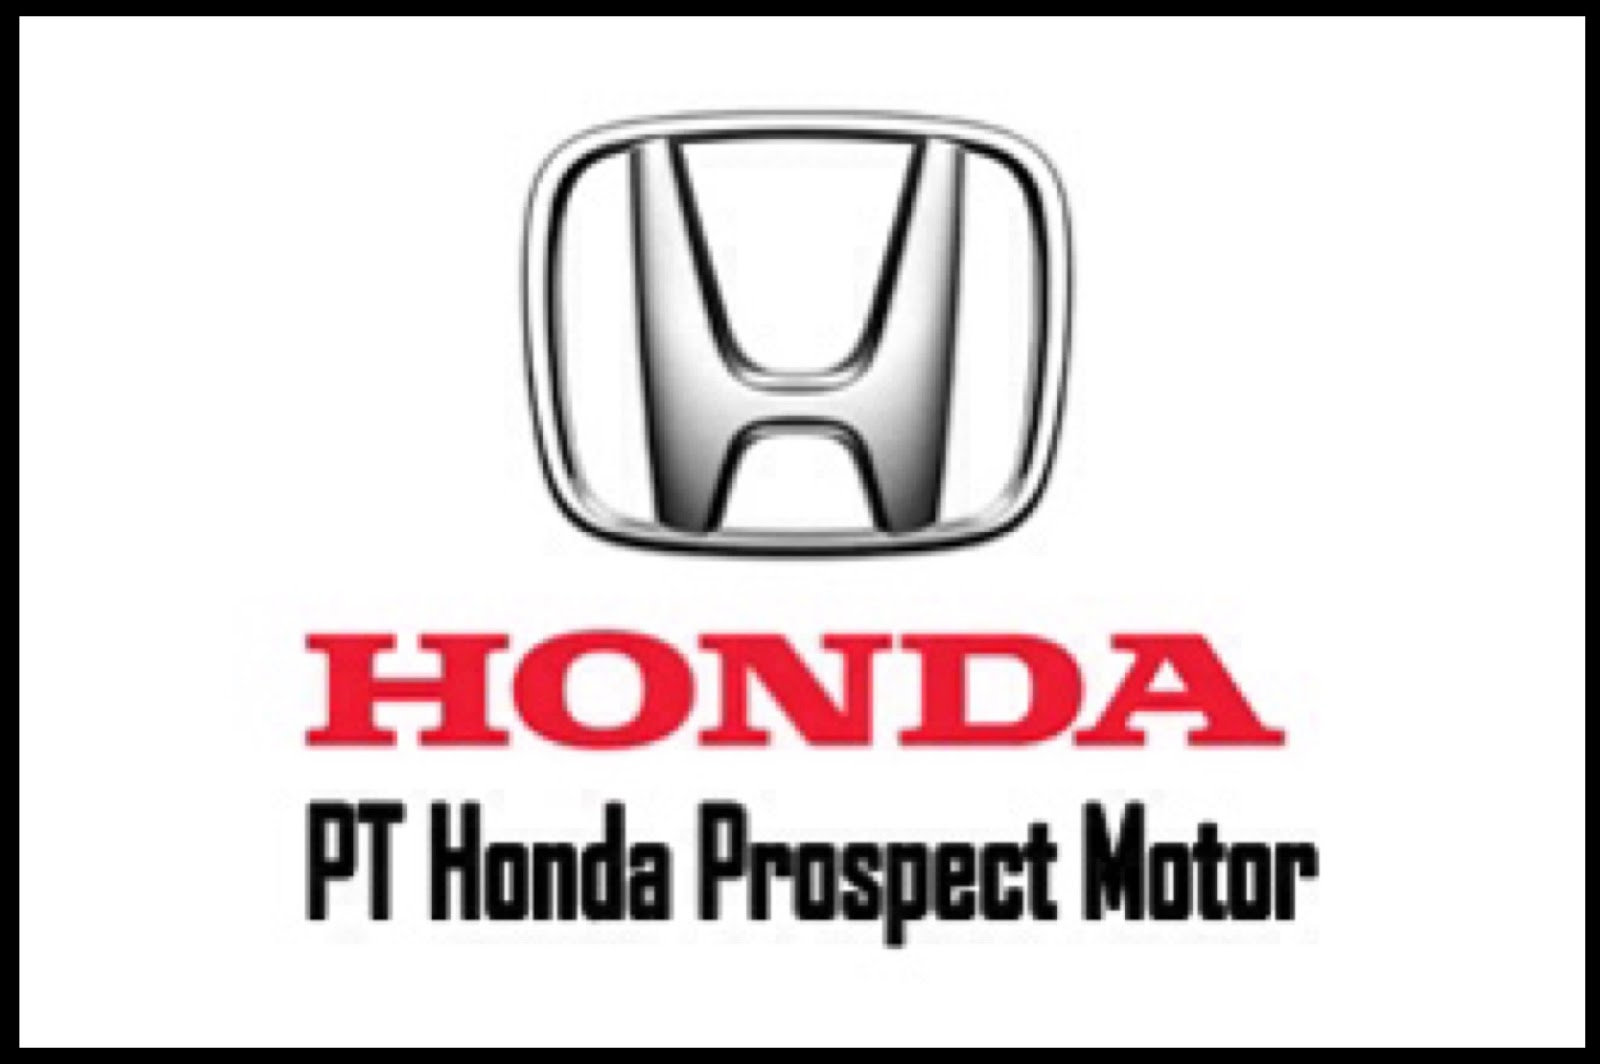 Lowongan Kerja Terbaru PT.Honda Prospect Motor